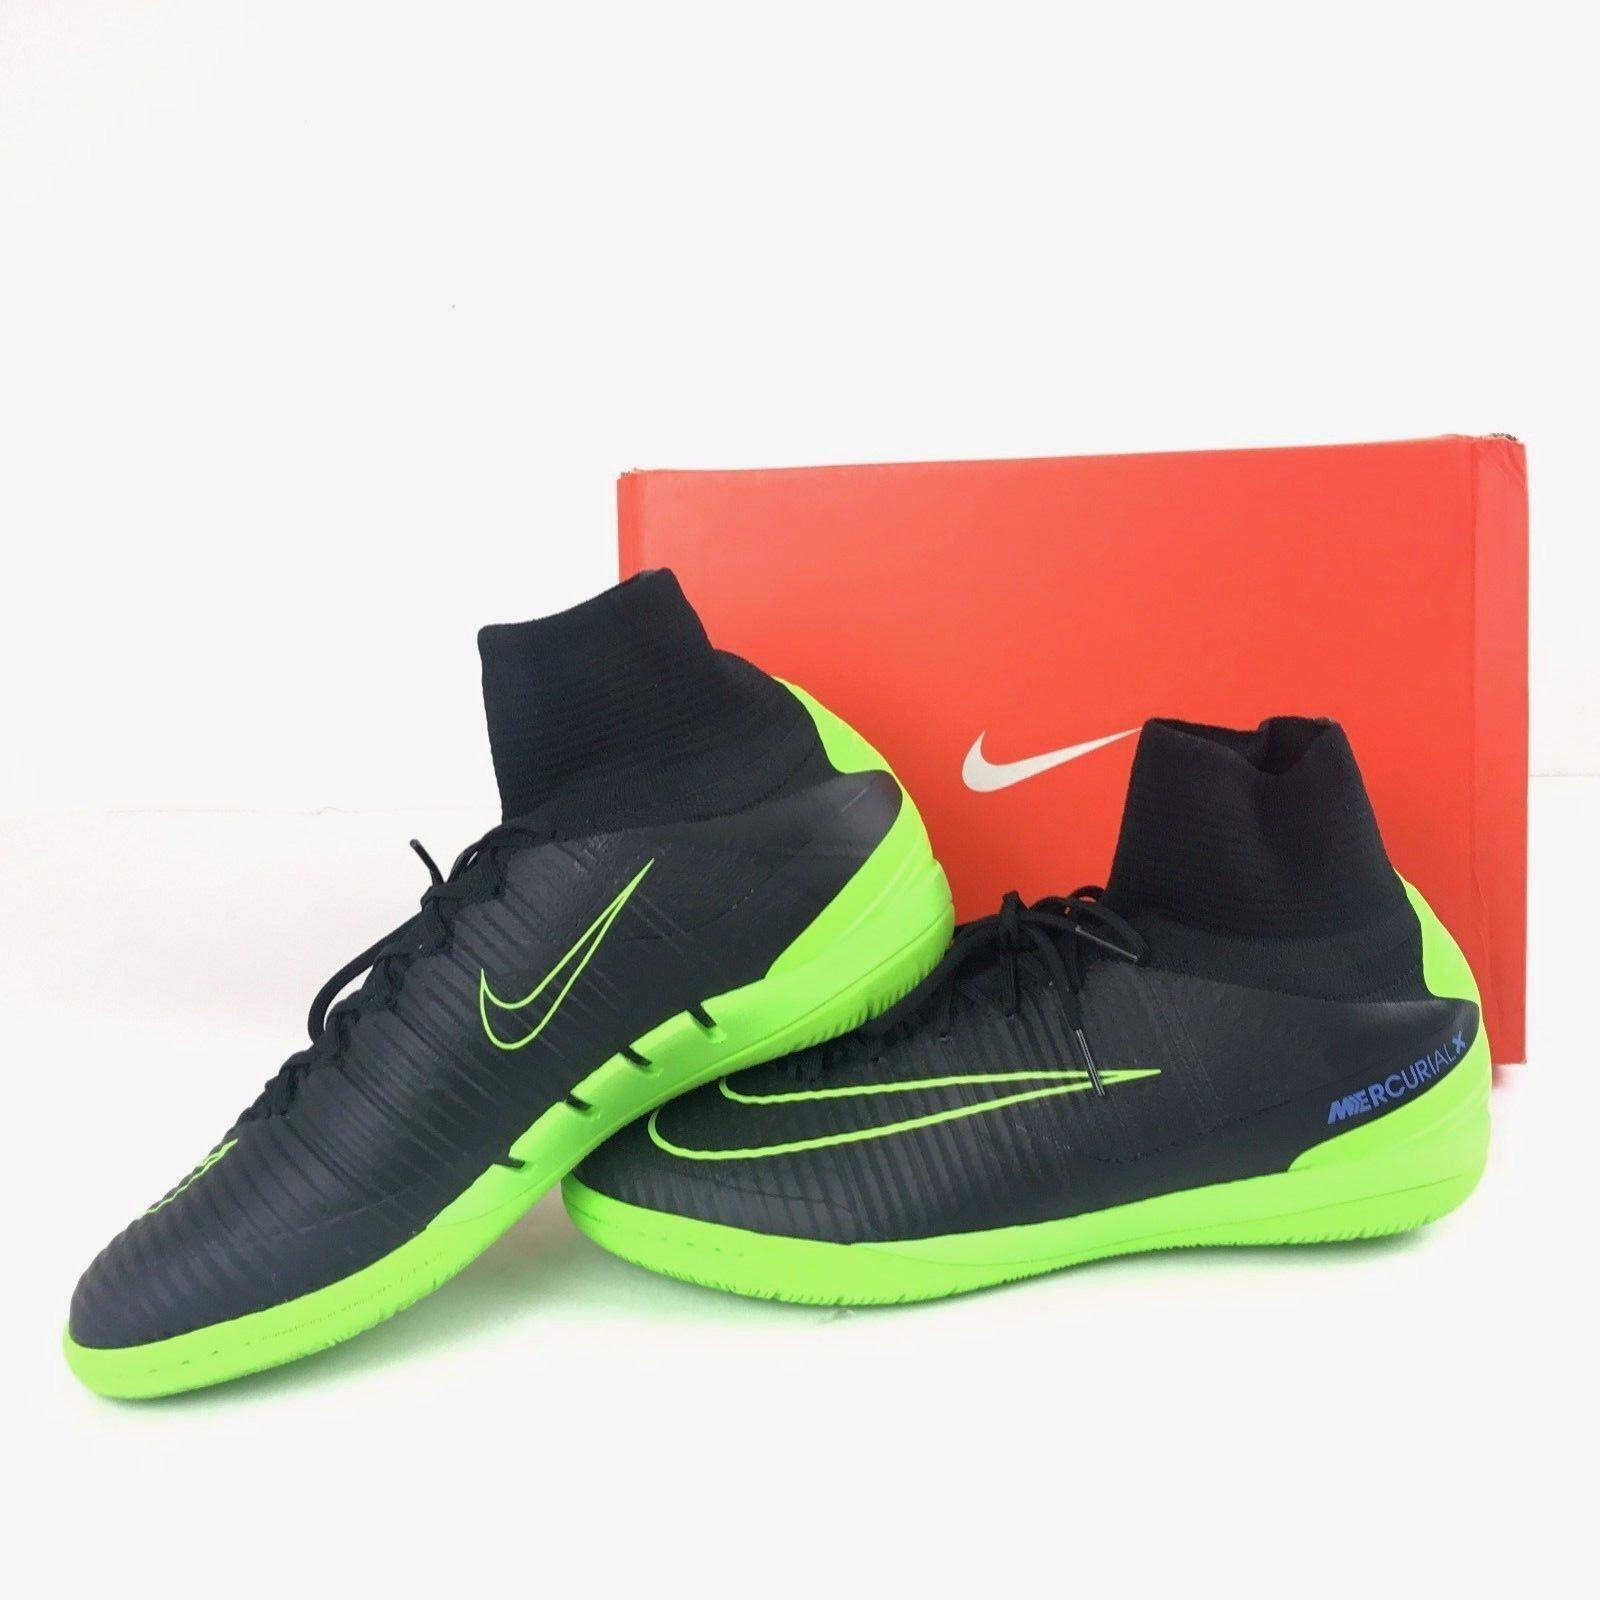 Nike Mercurialx Proximo II Ic Fútbol Indoor Zapatos Negros 831976-034 Talla 10.5